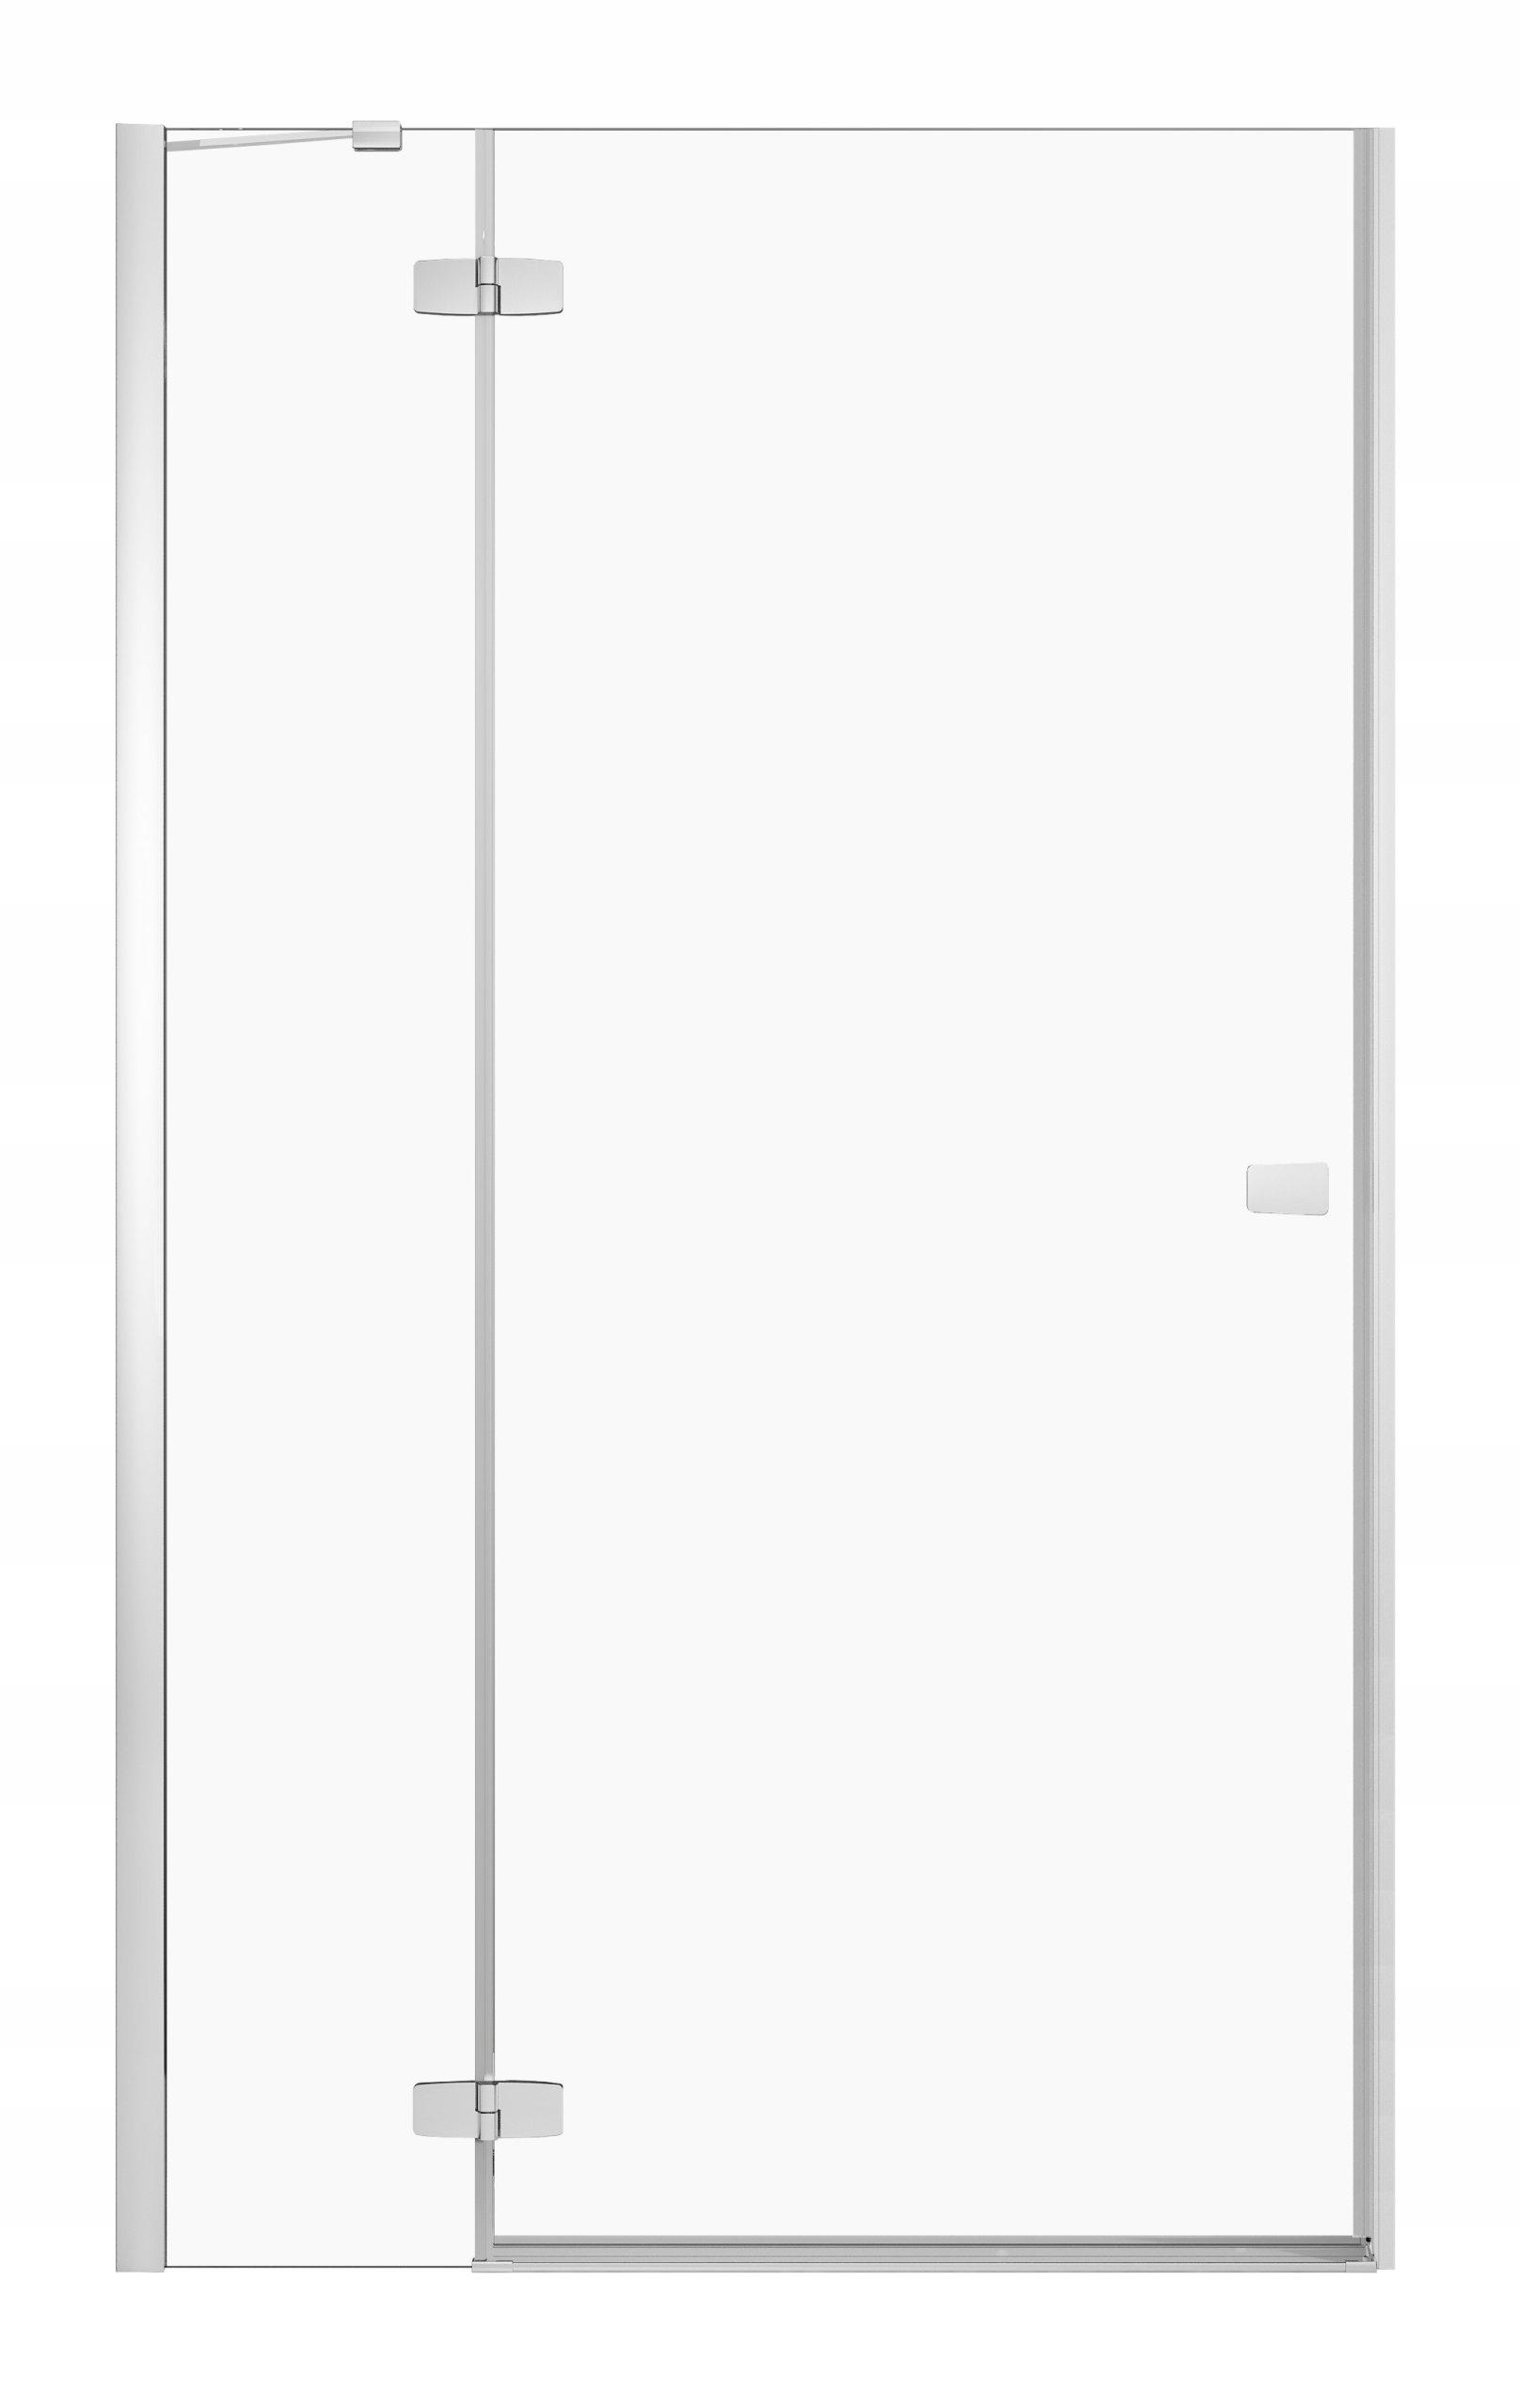 Fuenta Nové sprchové dvere DWJ 130x200 RADAWAY